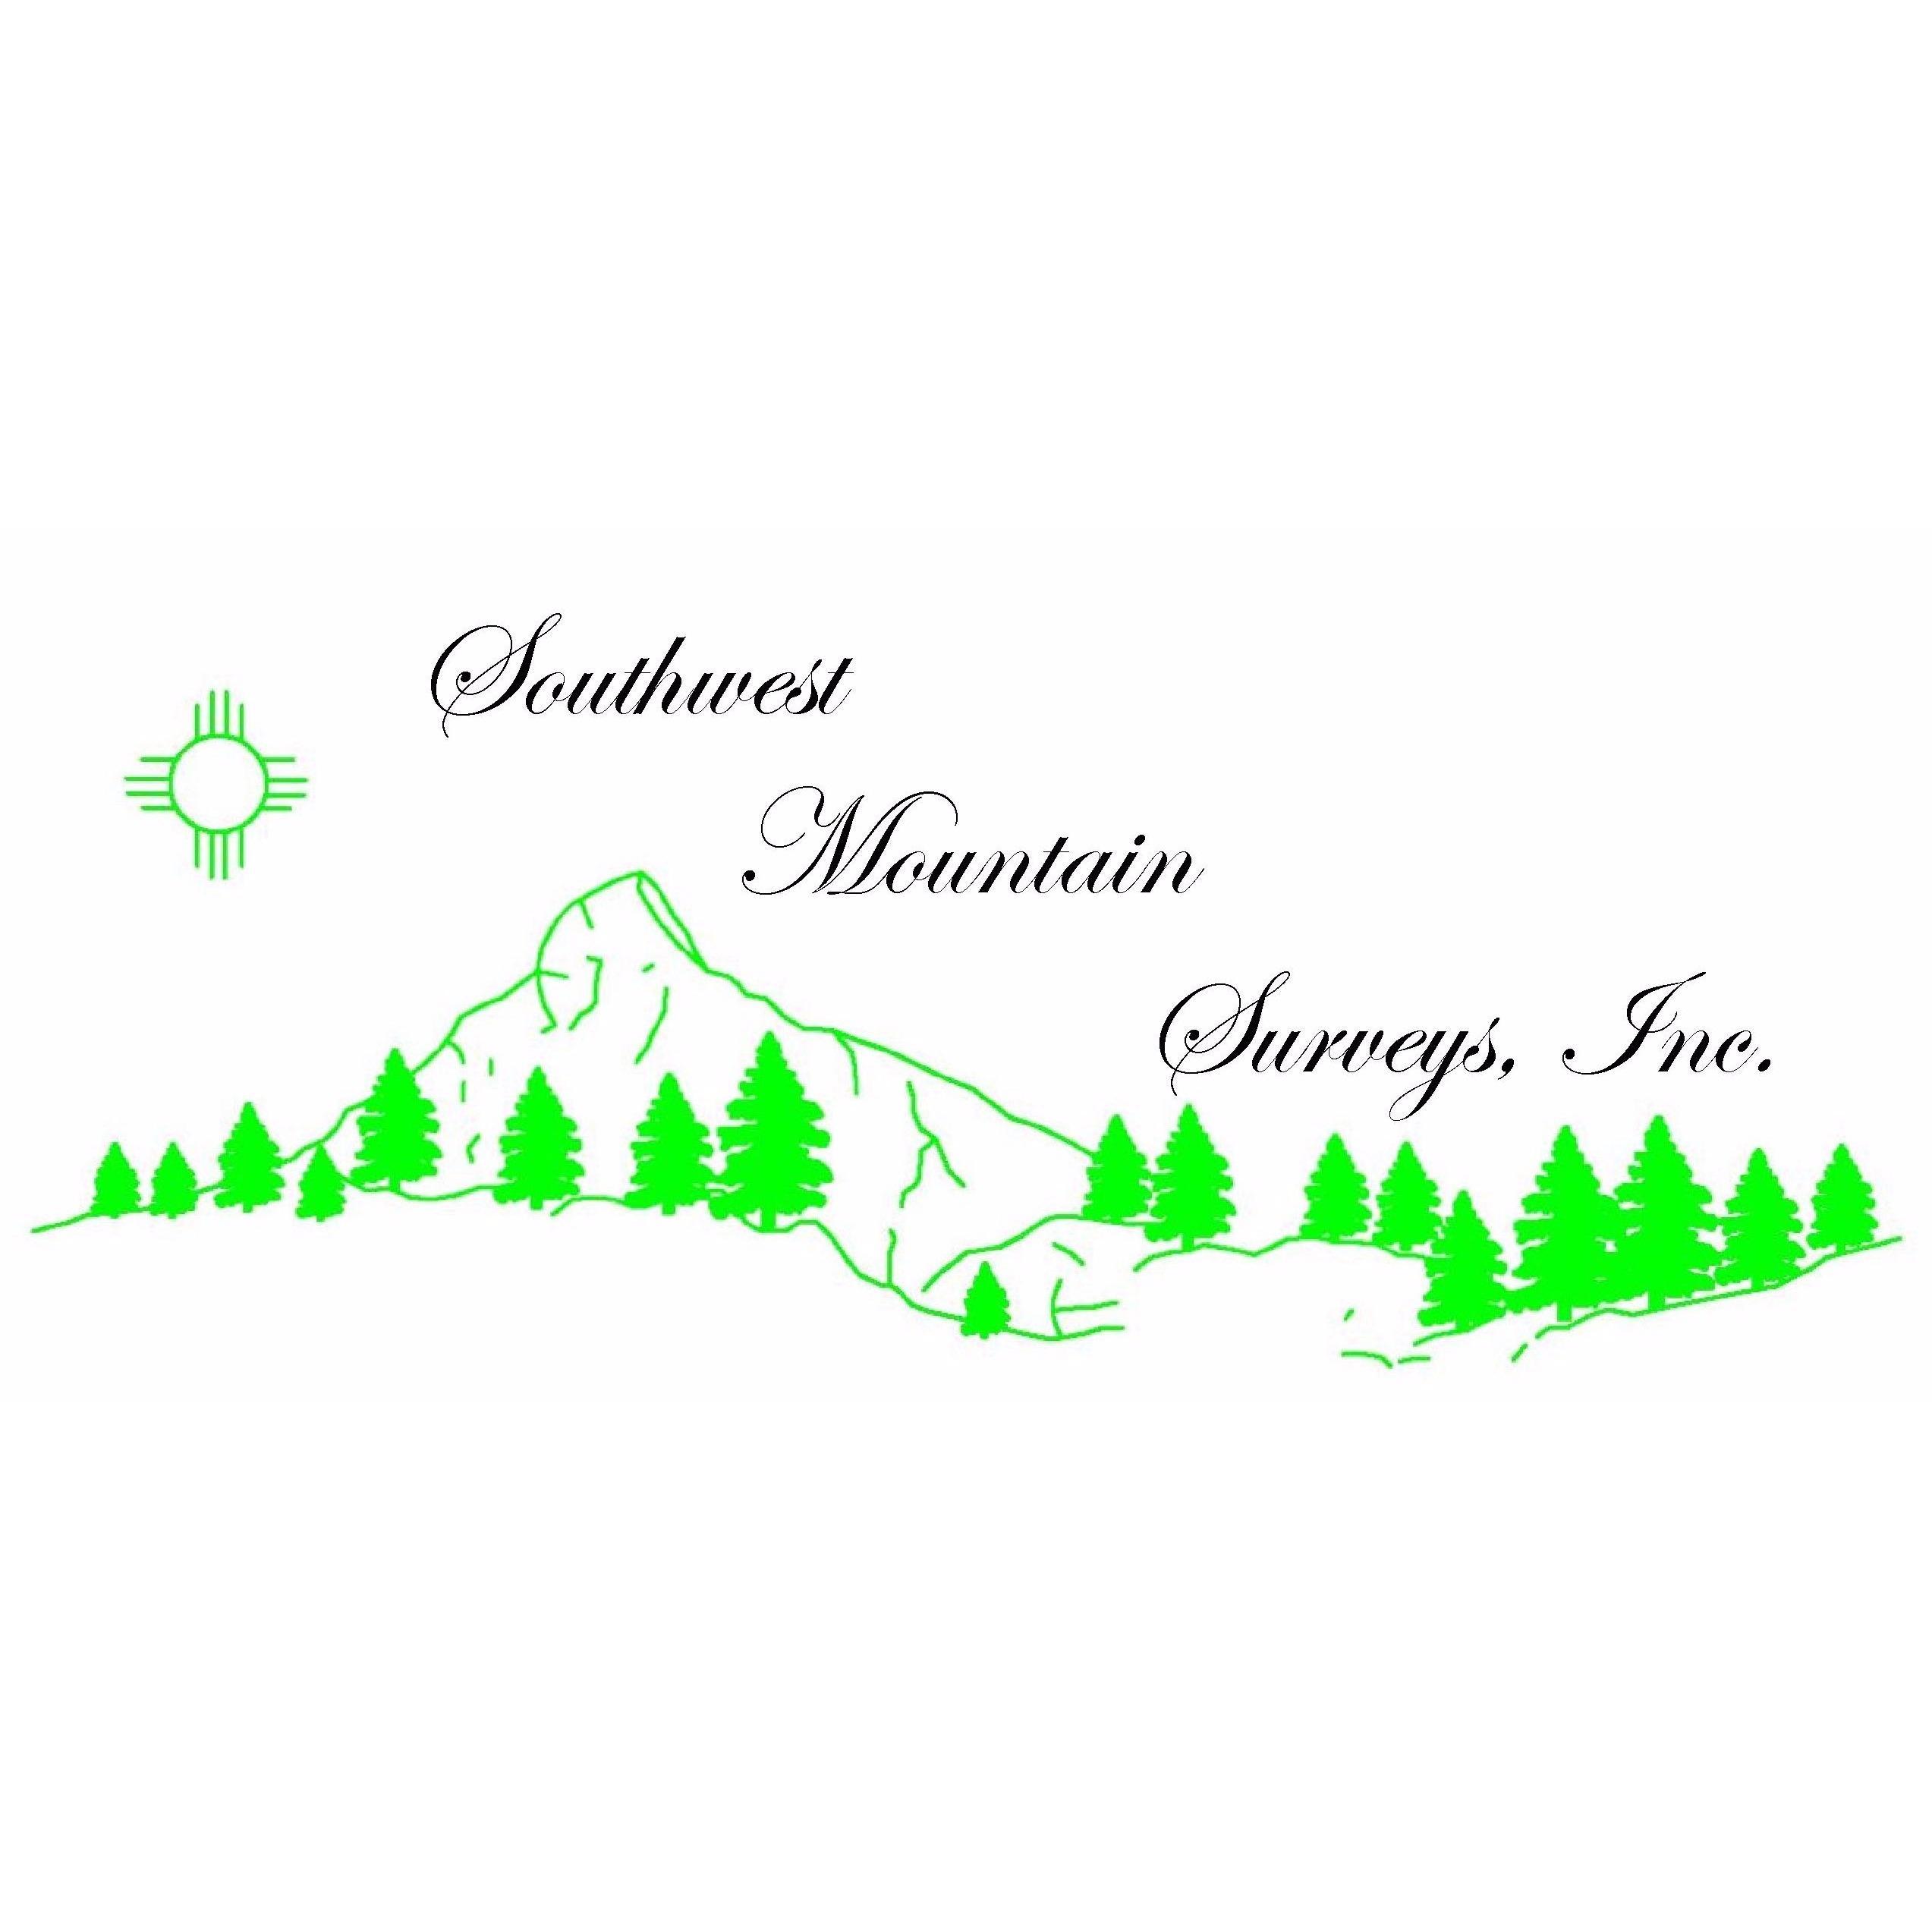 Southwest Mountain Surveys, Inc.